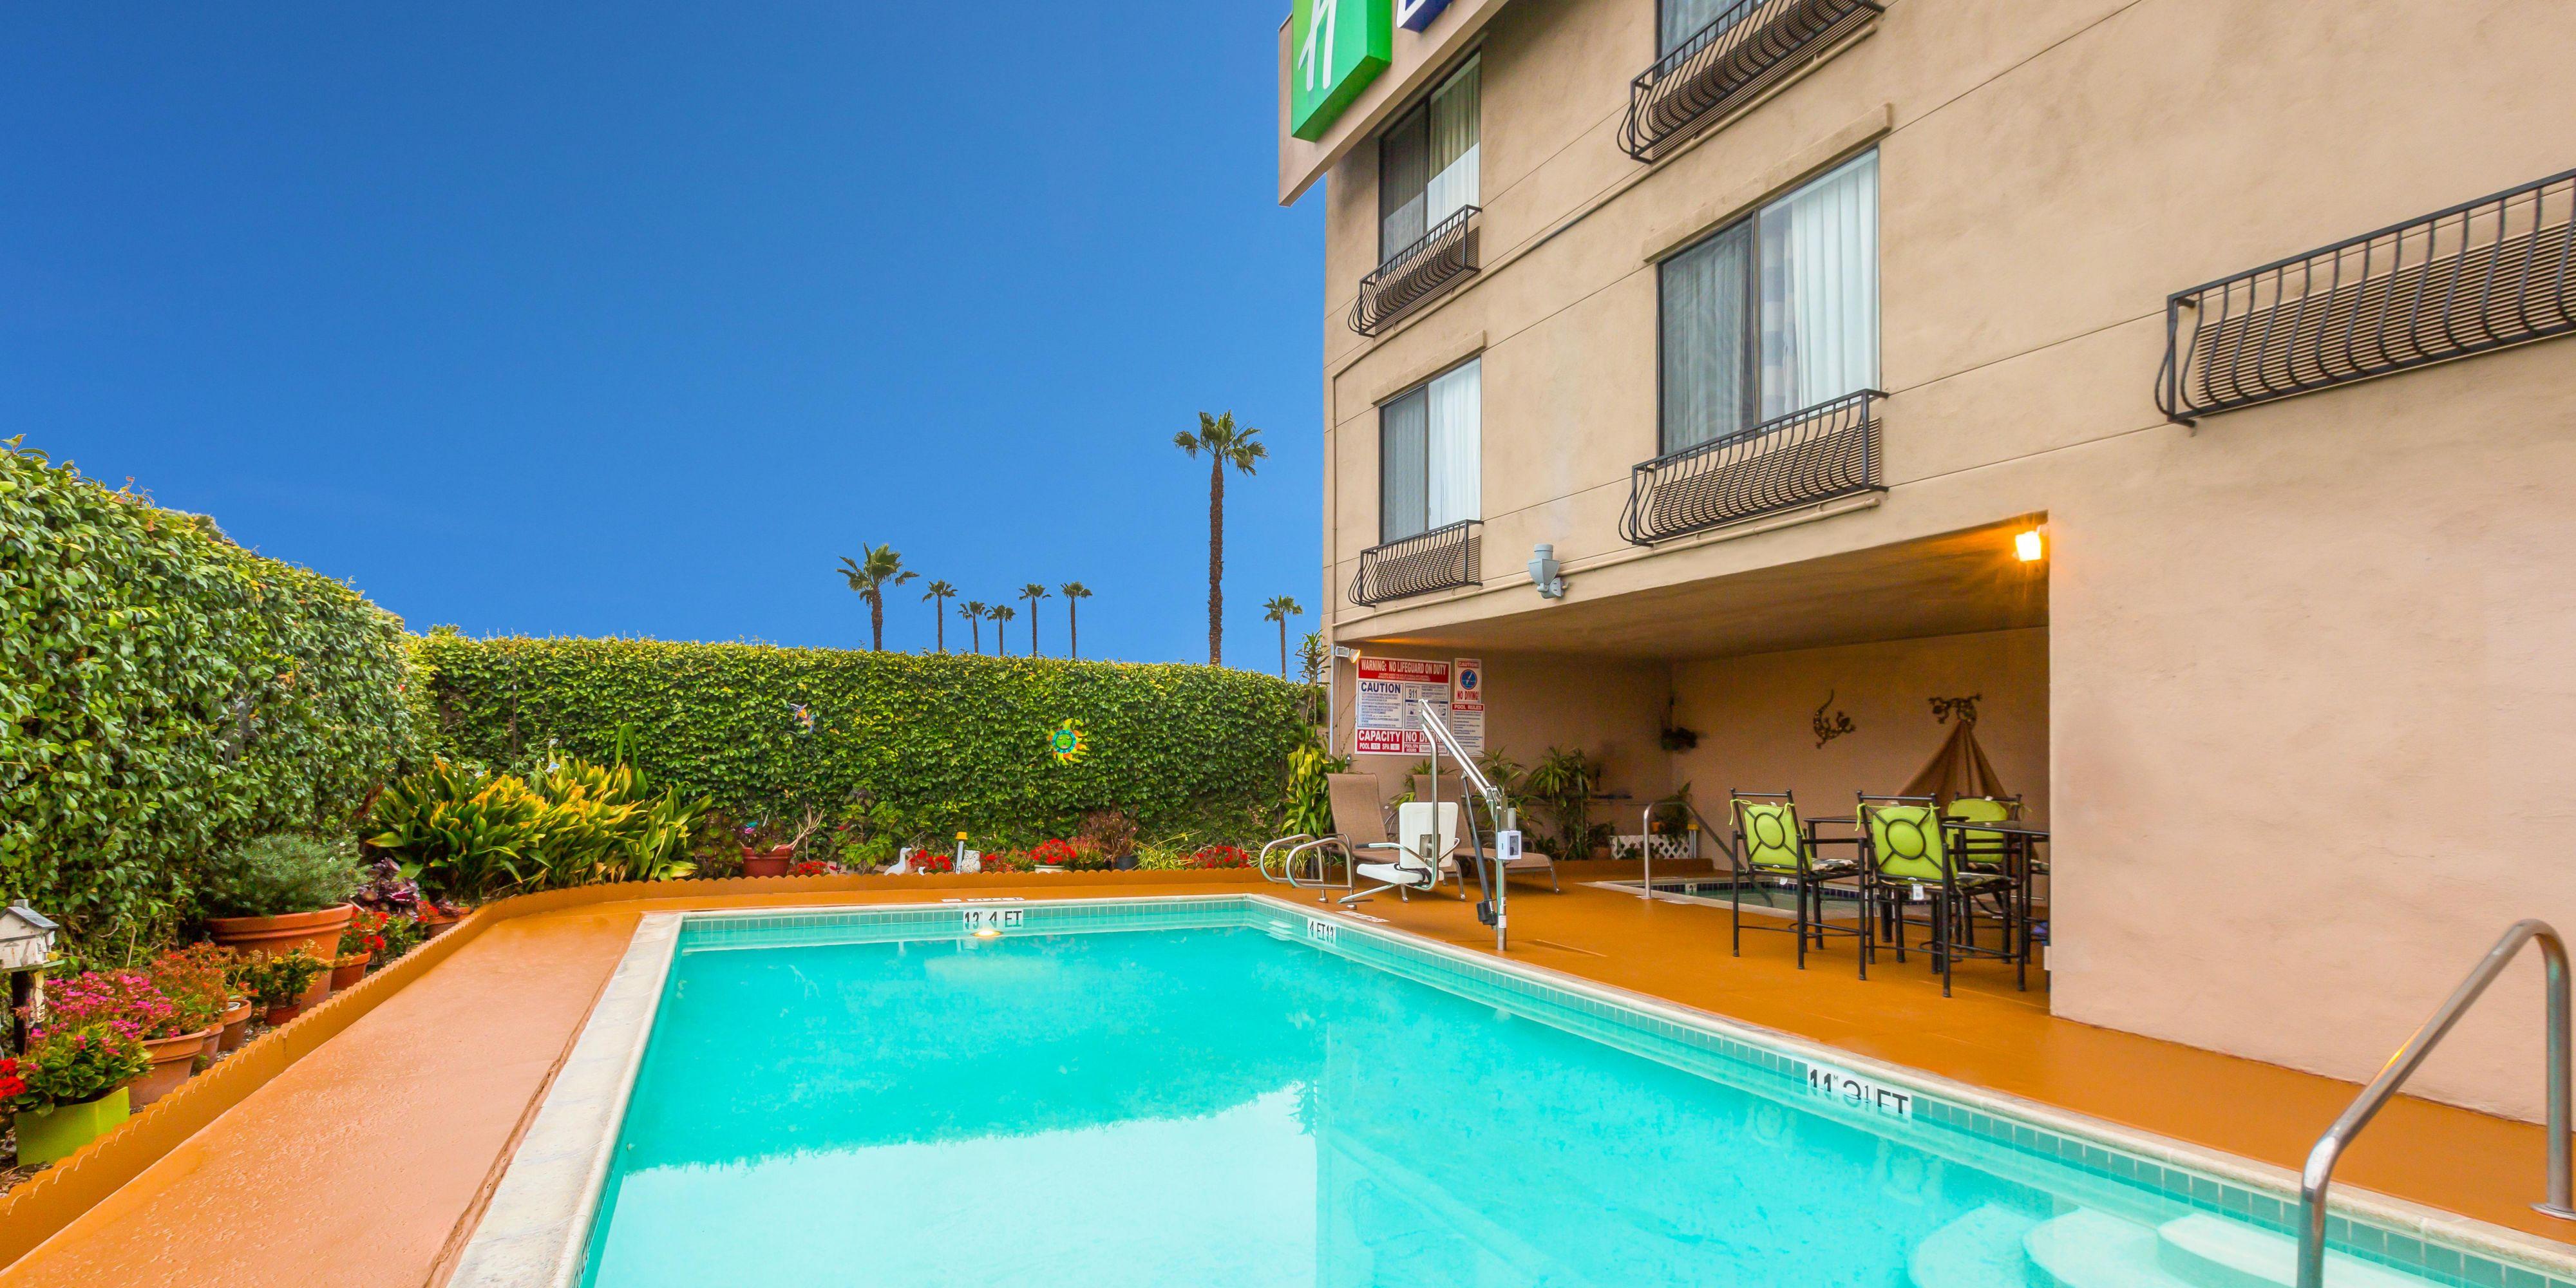 Holiday Inn Express San Diego 4561560588 2x1